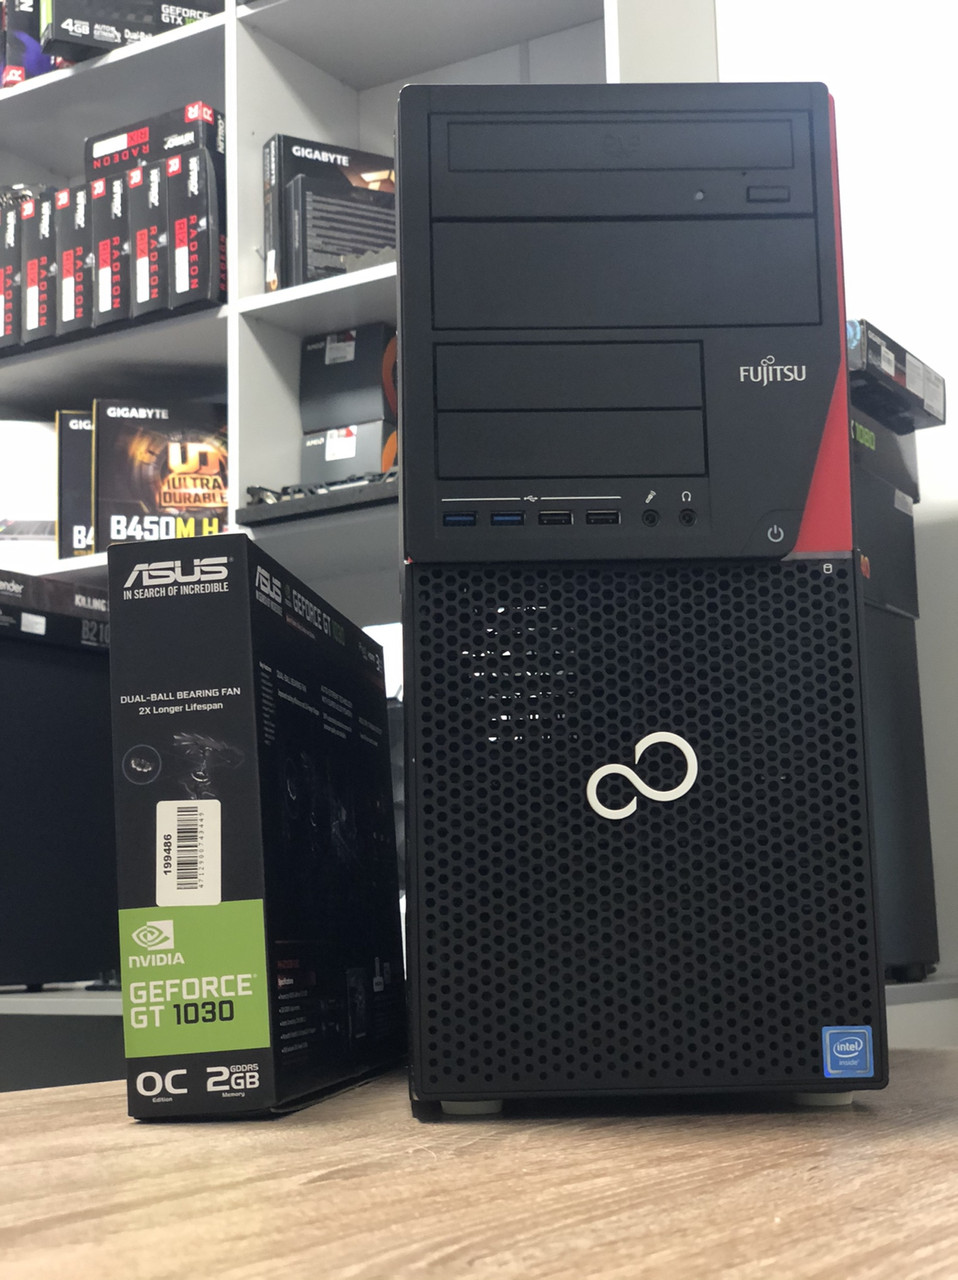 Компьютер PC Fujitsu P720 Intel Core i5-4570 RAM 8GB HDD 500GB PCI GT1030 2GB